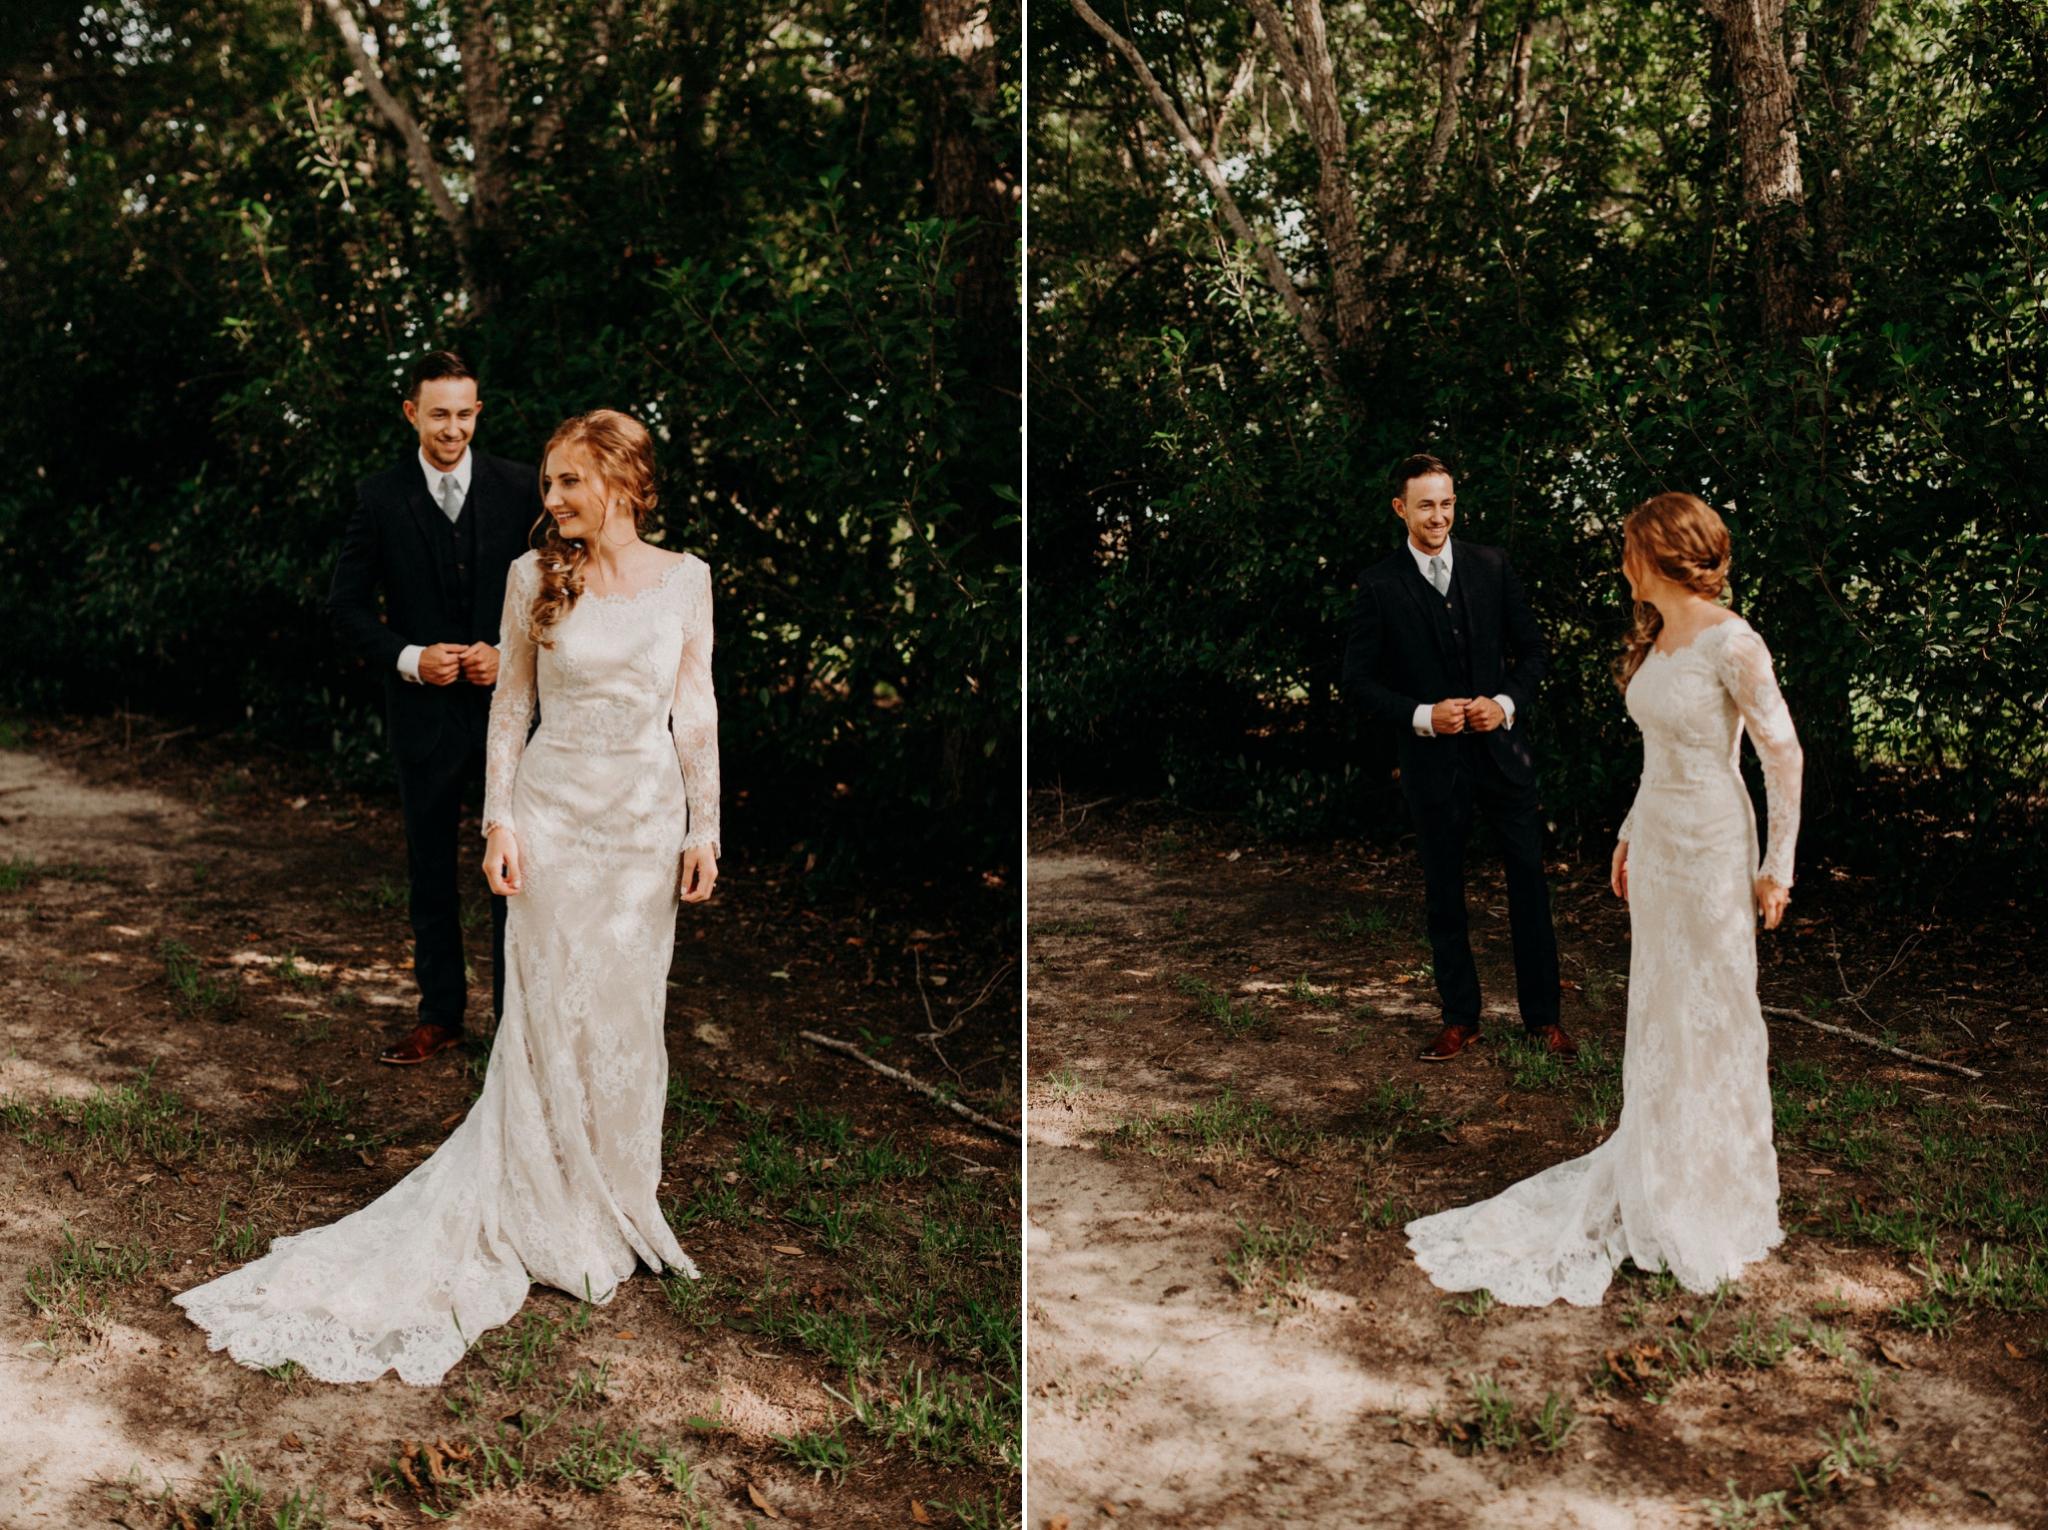 cottages-on-mill-creek-first-look-bohemian-floral-greenery-lakeside-intimate-houston-wedding-kerlyn-van-gelder-photography-wedding-photographer